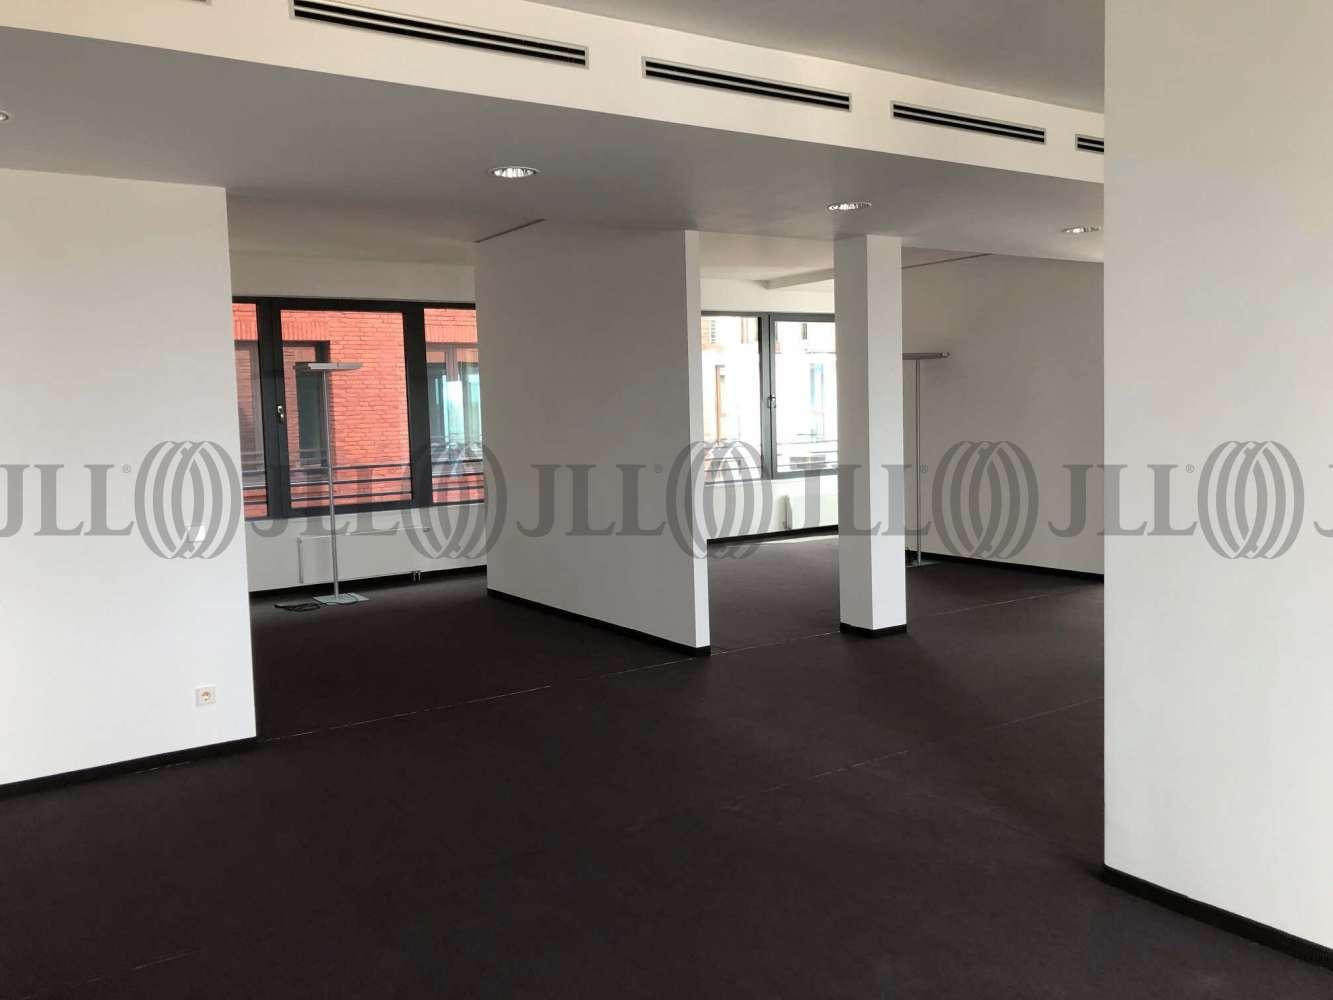 Büros Frankfurt am main, 60314 - Büro - Frankfurt am Main, Ostend - F1213 - 10157928